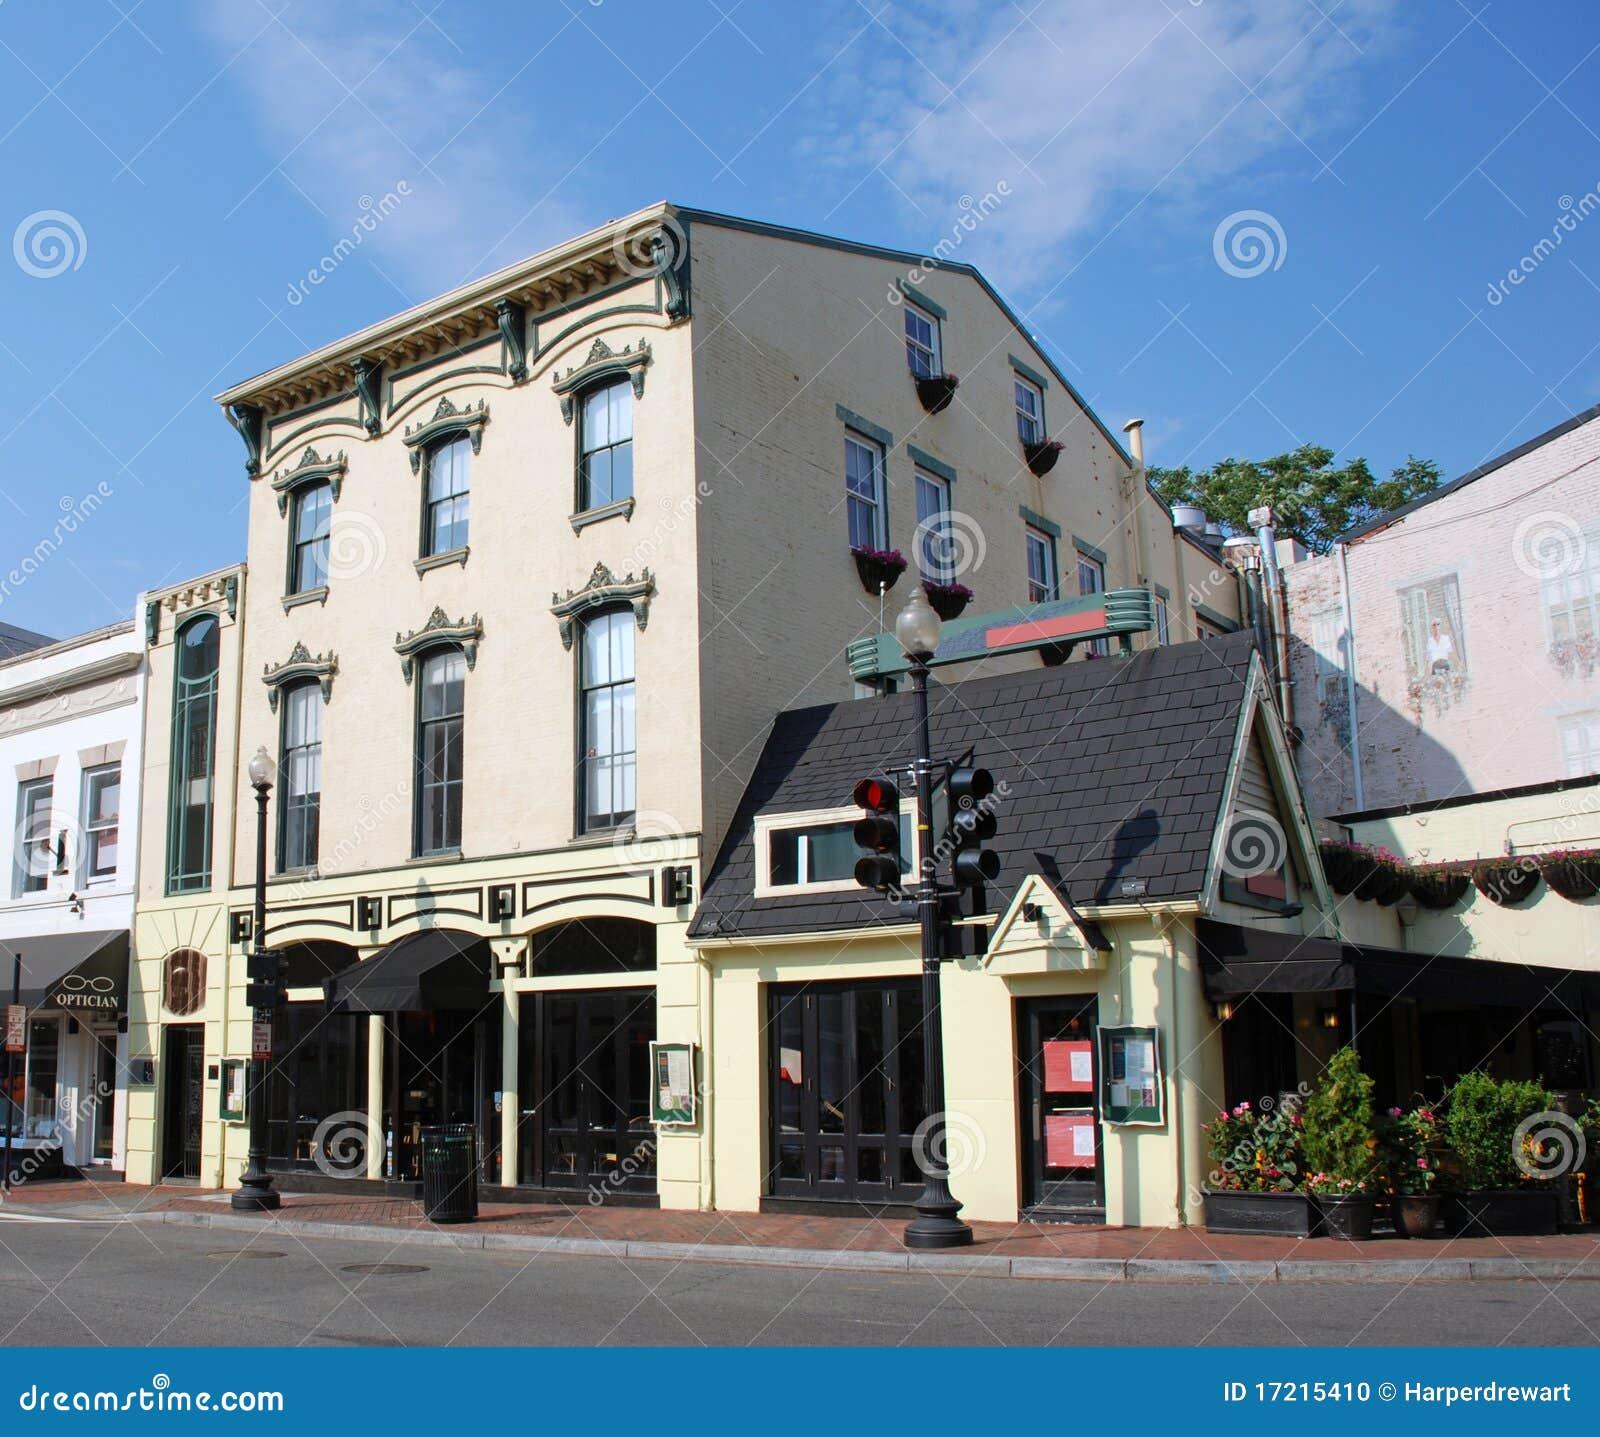 10 Light Street Apartments: Small Town Main Street 7 Stock Photo. Image Of England